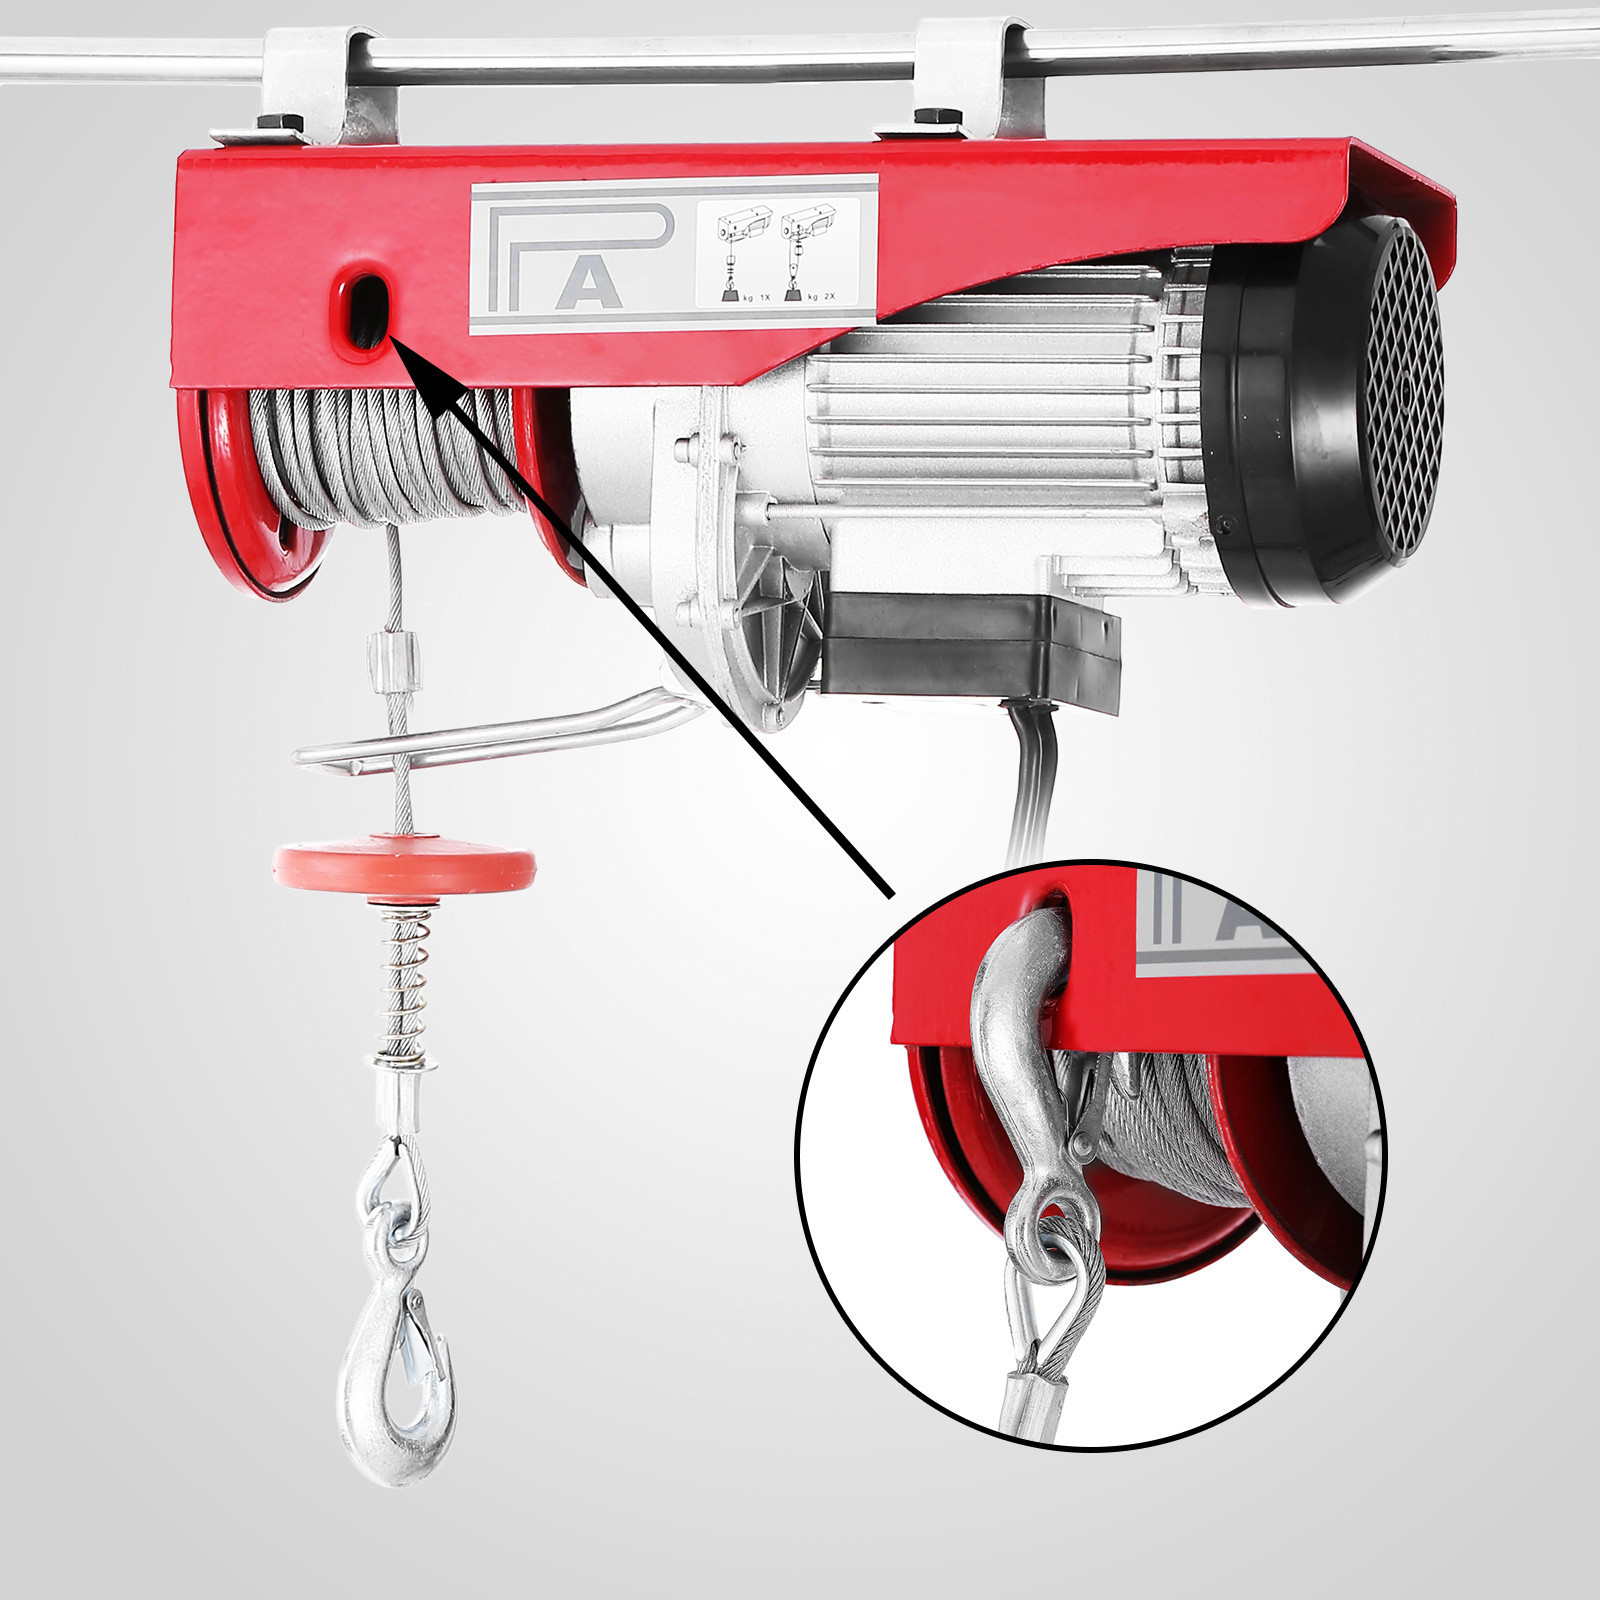 100kg-900kg-Electric-Hoist-Winch-Lifting-Engine-Crane-Cable-Lift-Hook-Garage miniature 36